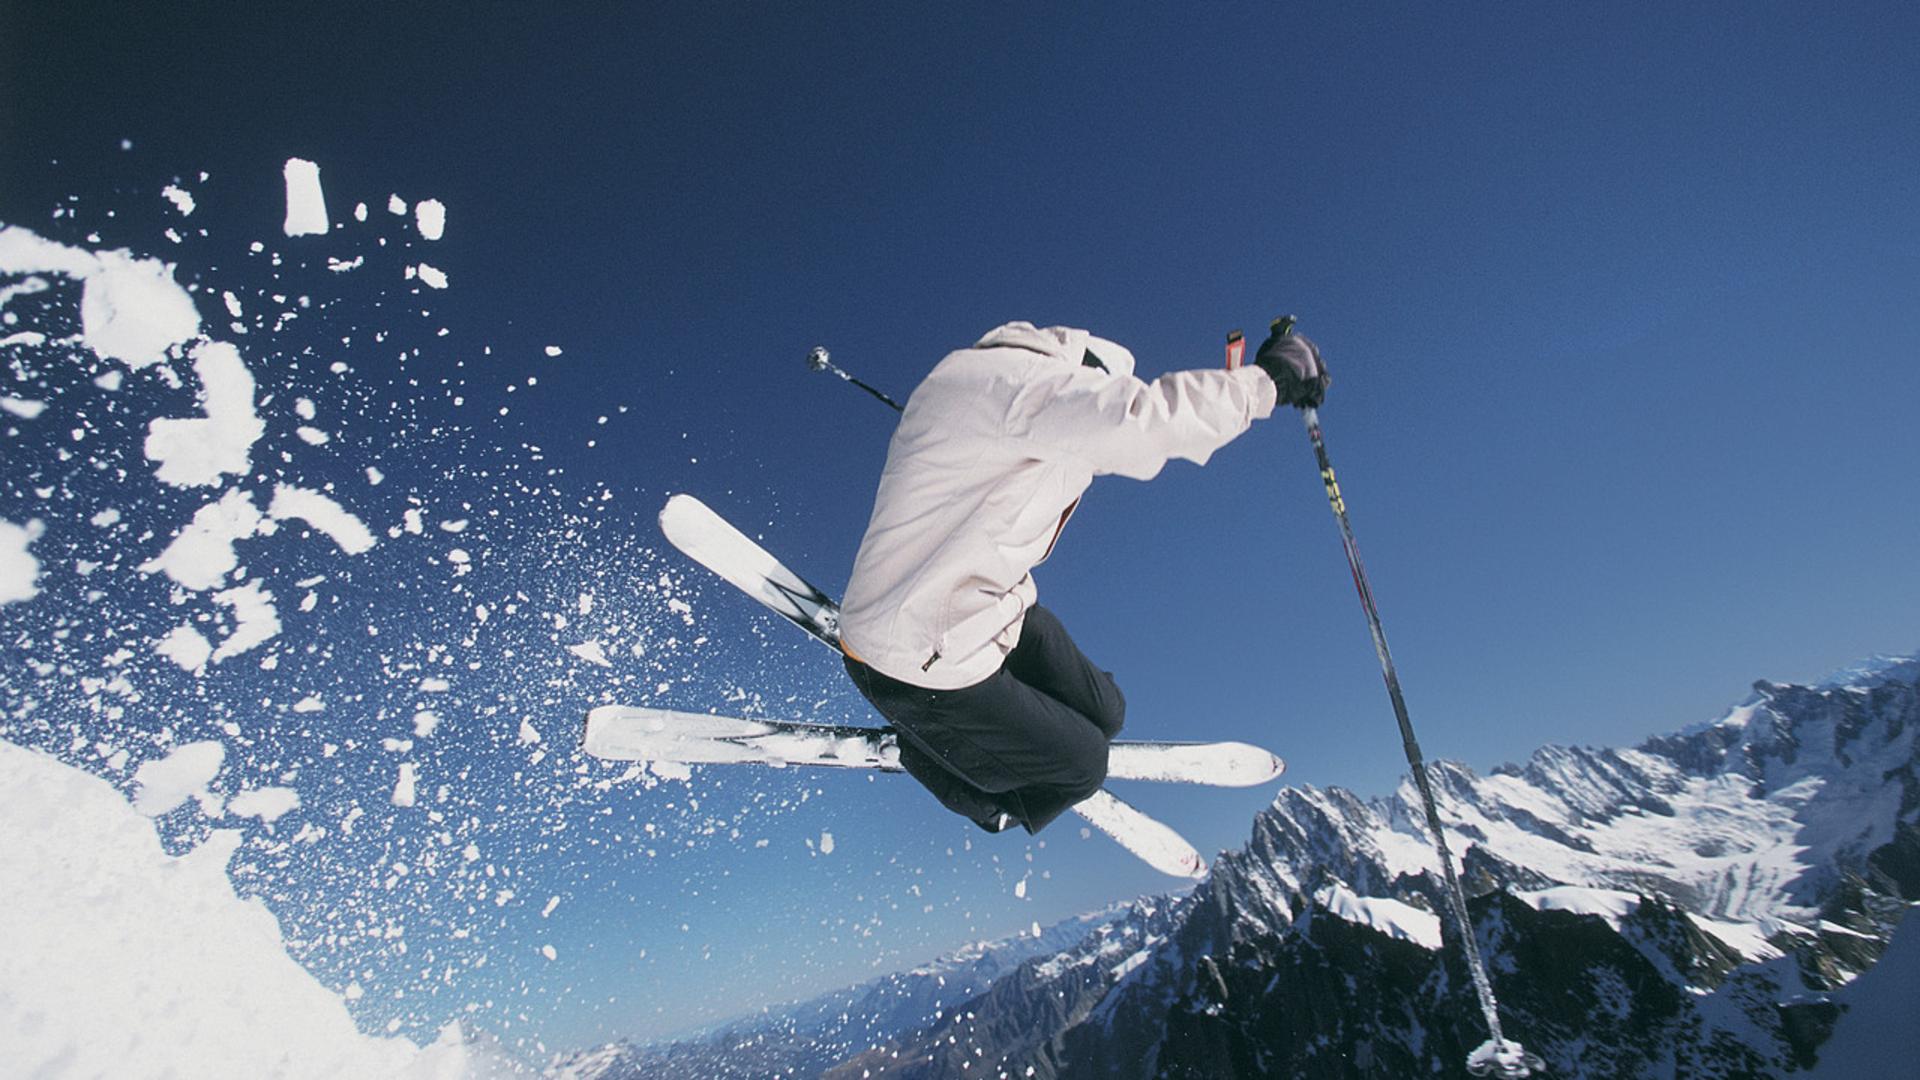 skiing wallpaper 4100